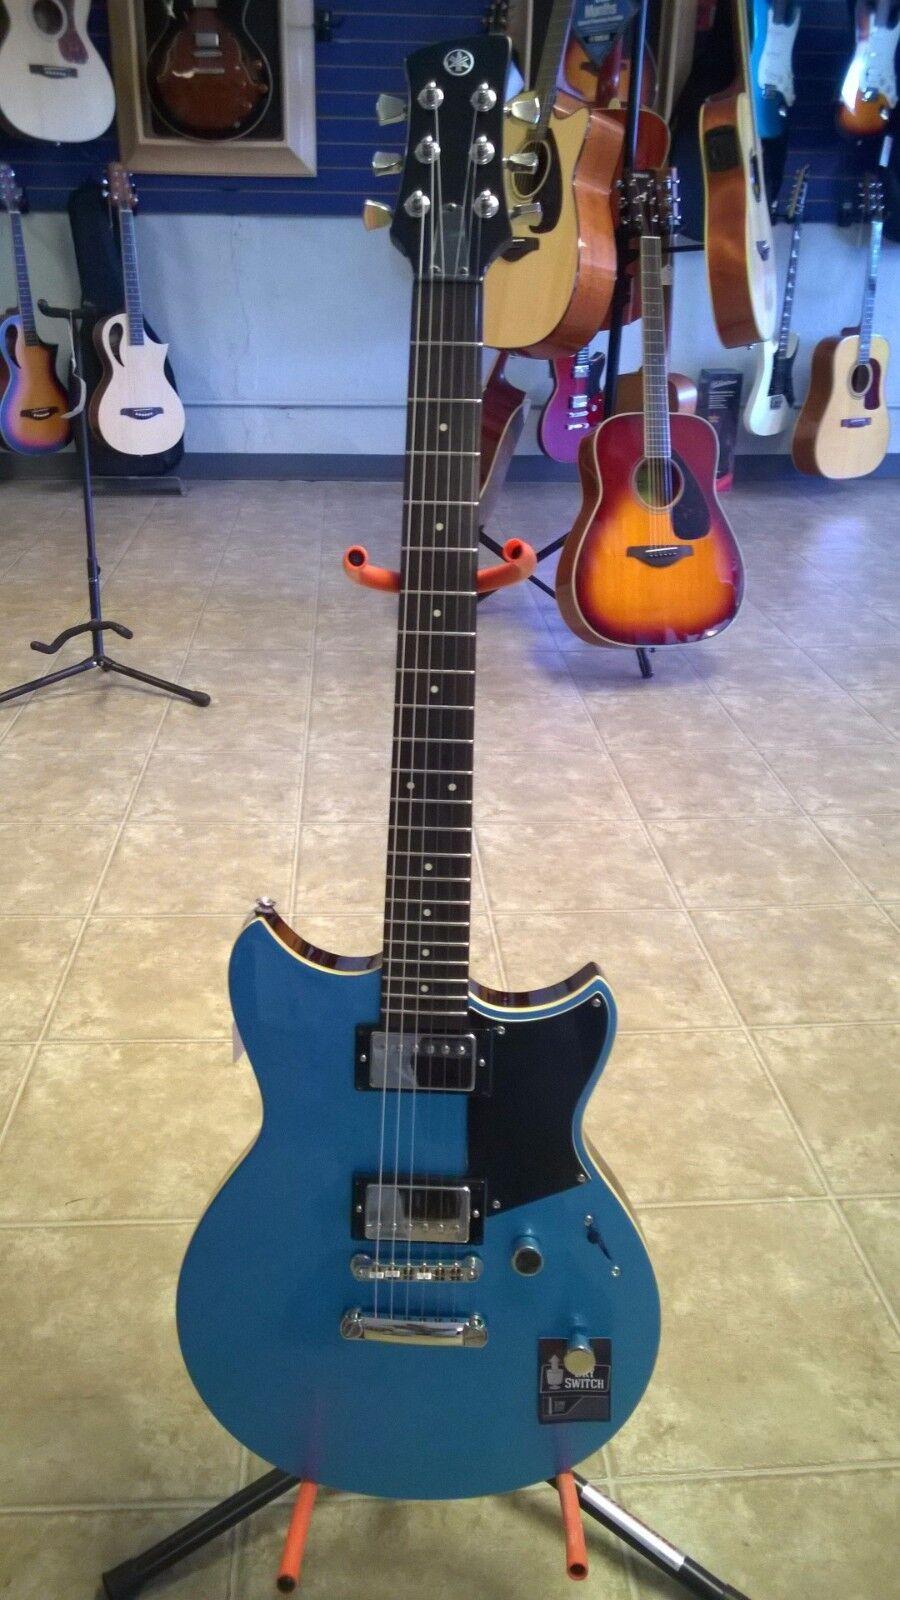 Yamaha REVSTAR RS420 Guitarra Guitarra Guitarra Eléctrica Fábrica Azul Series  tomar hasta un 70% de descuento